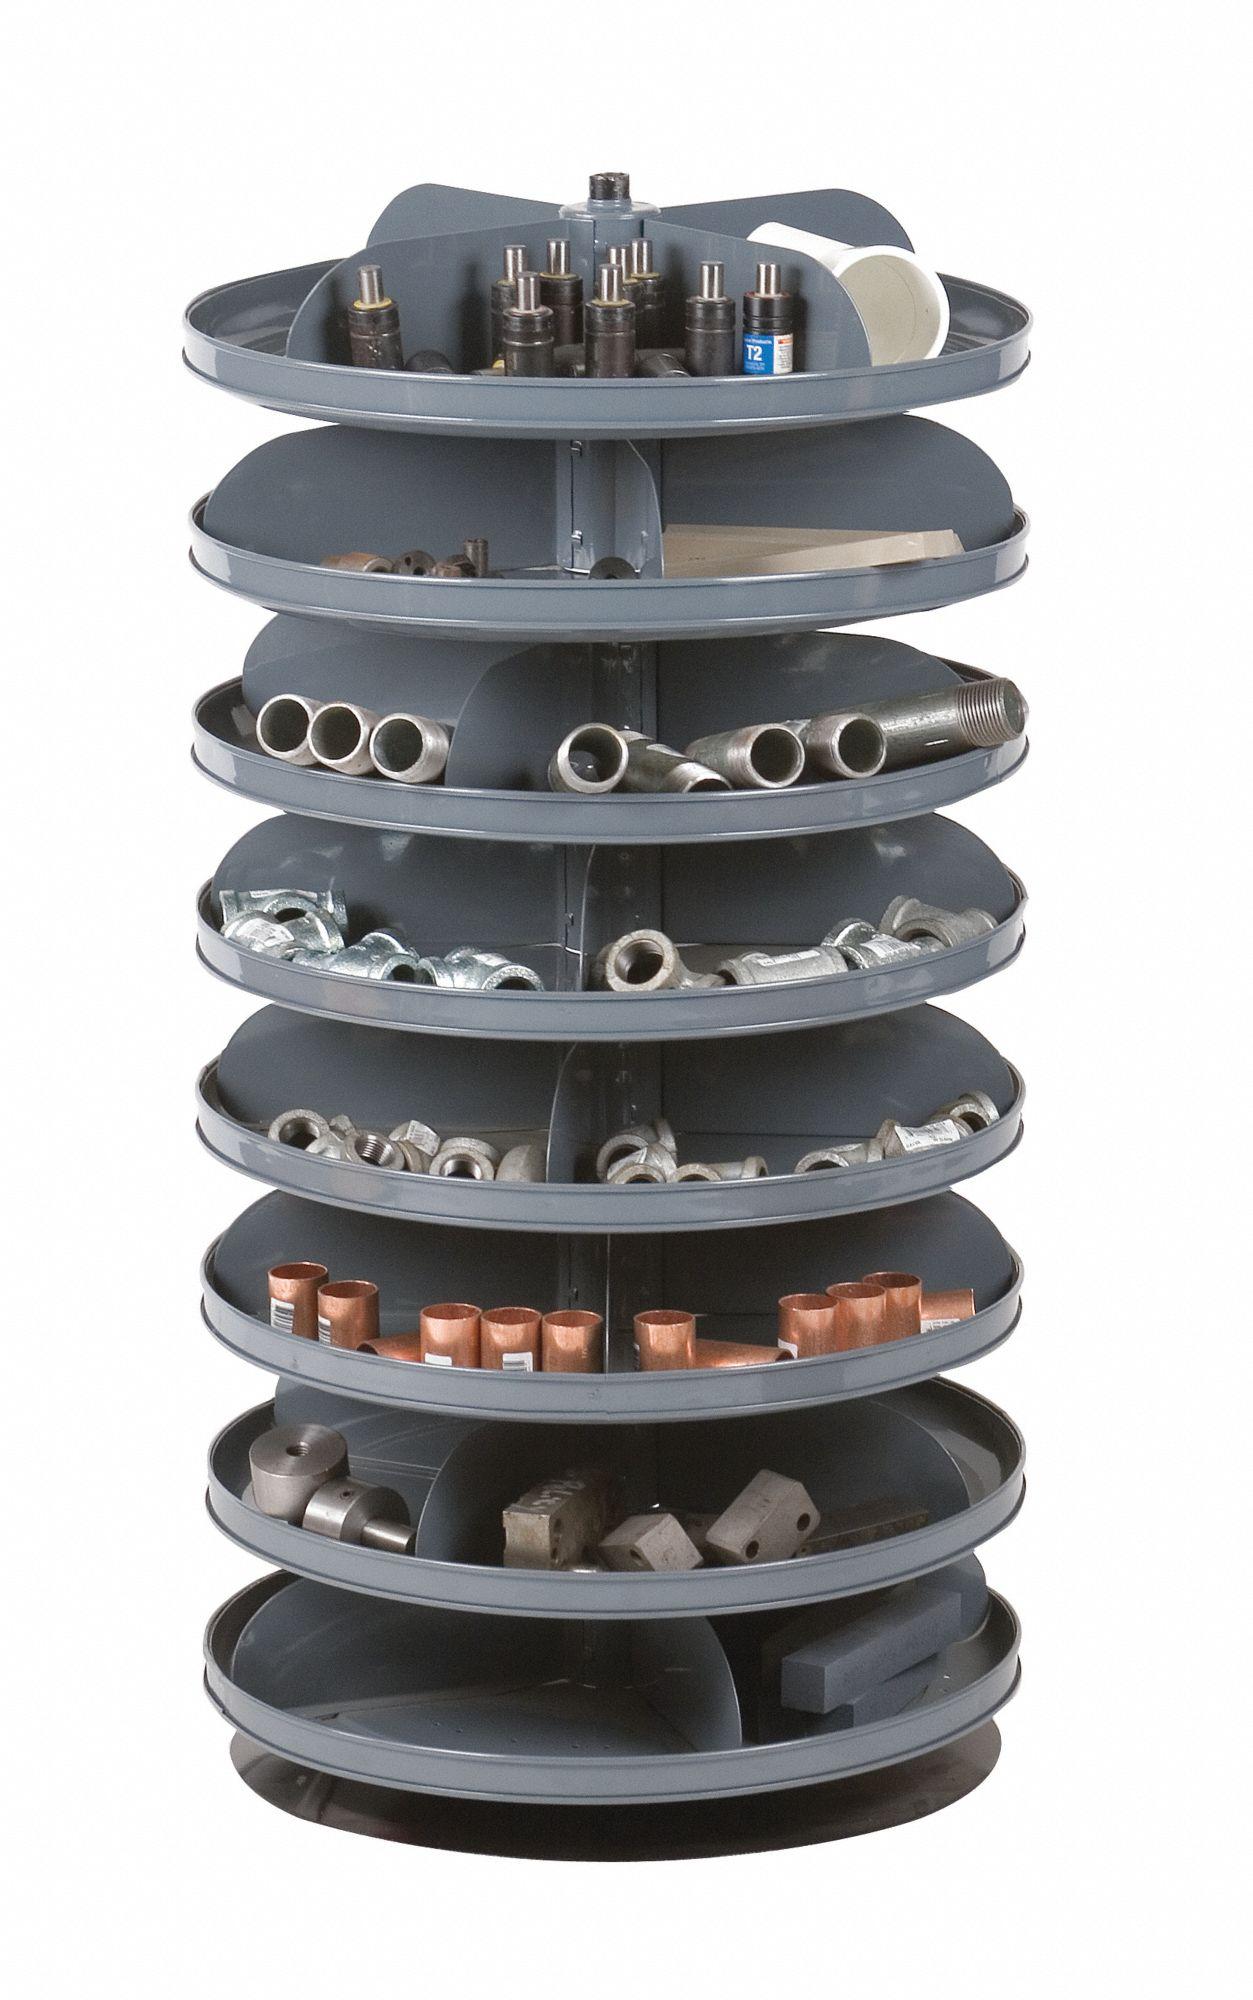 Revolving Storage Bins And Racks